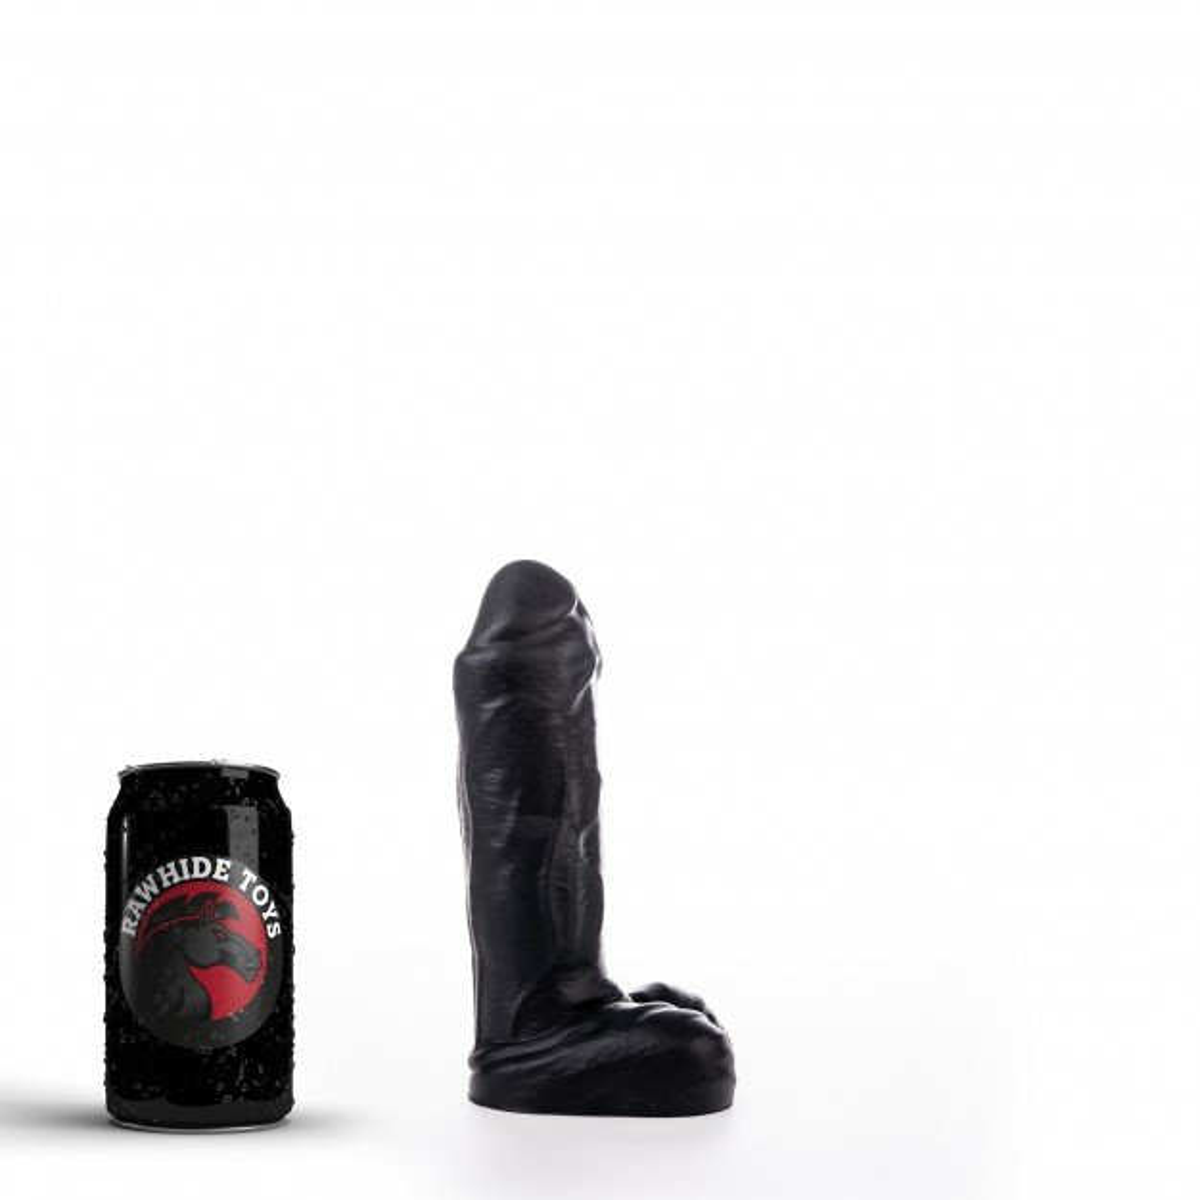 Rawhide Toys Vega Dildo Small Black